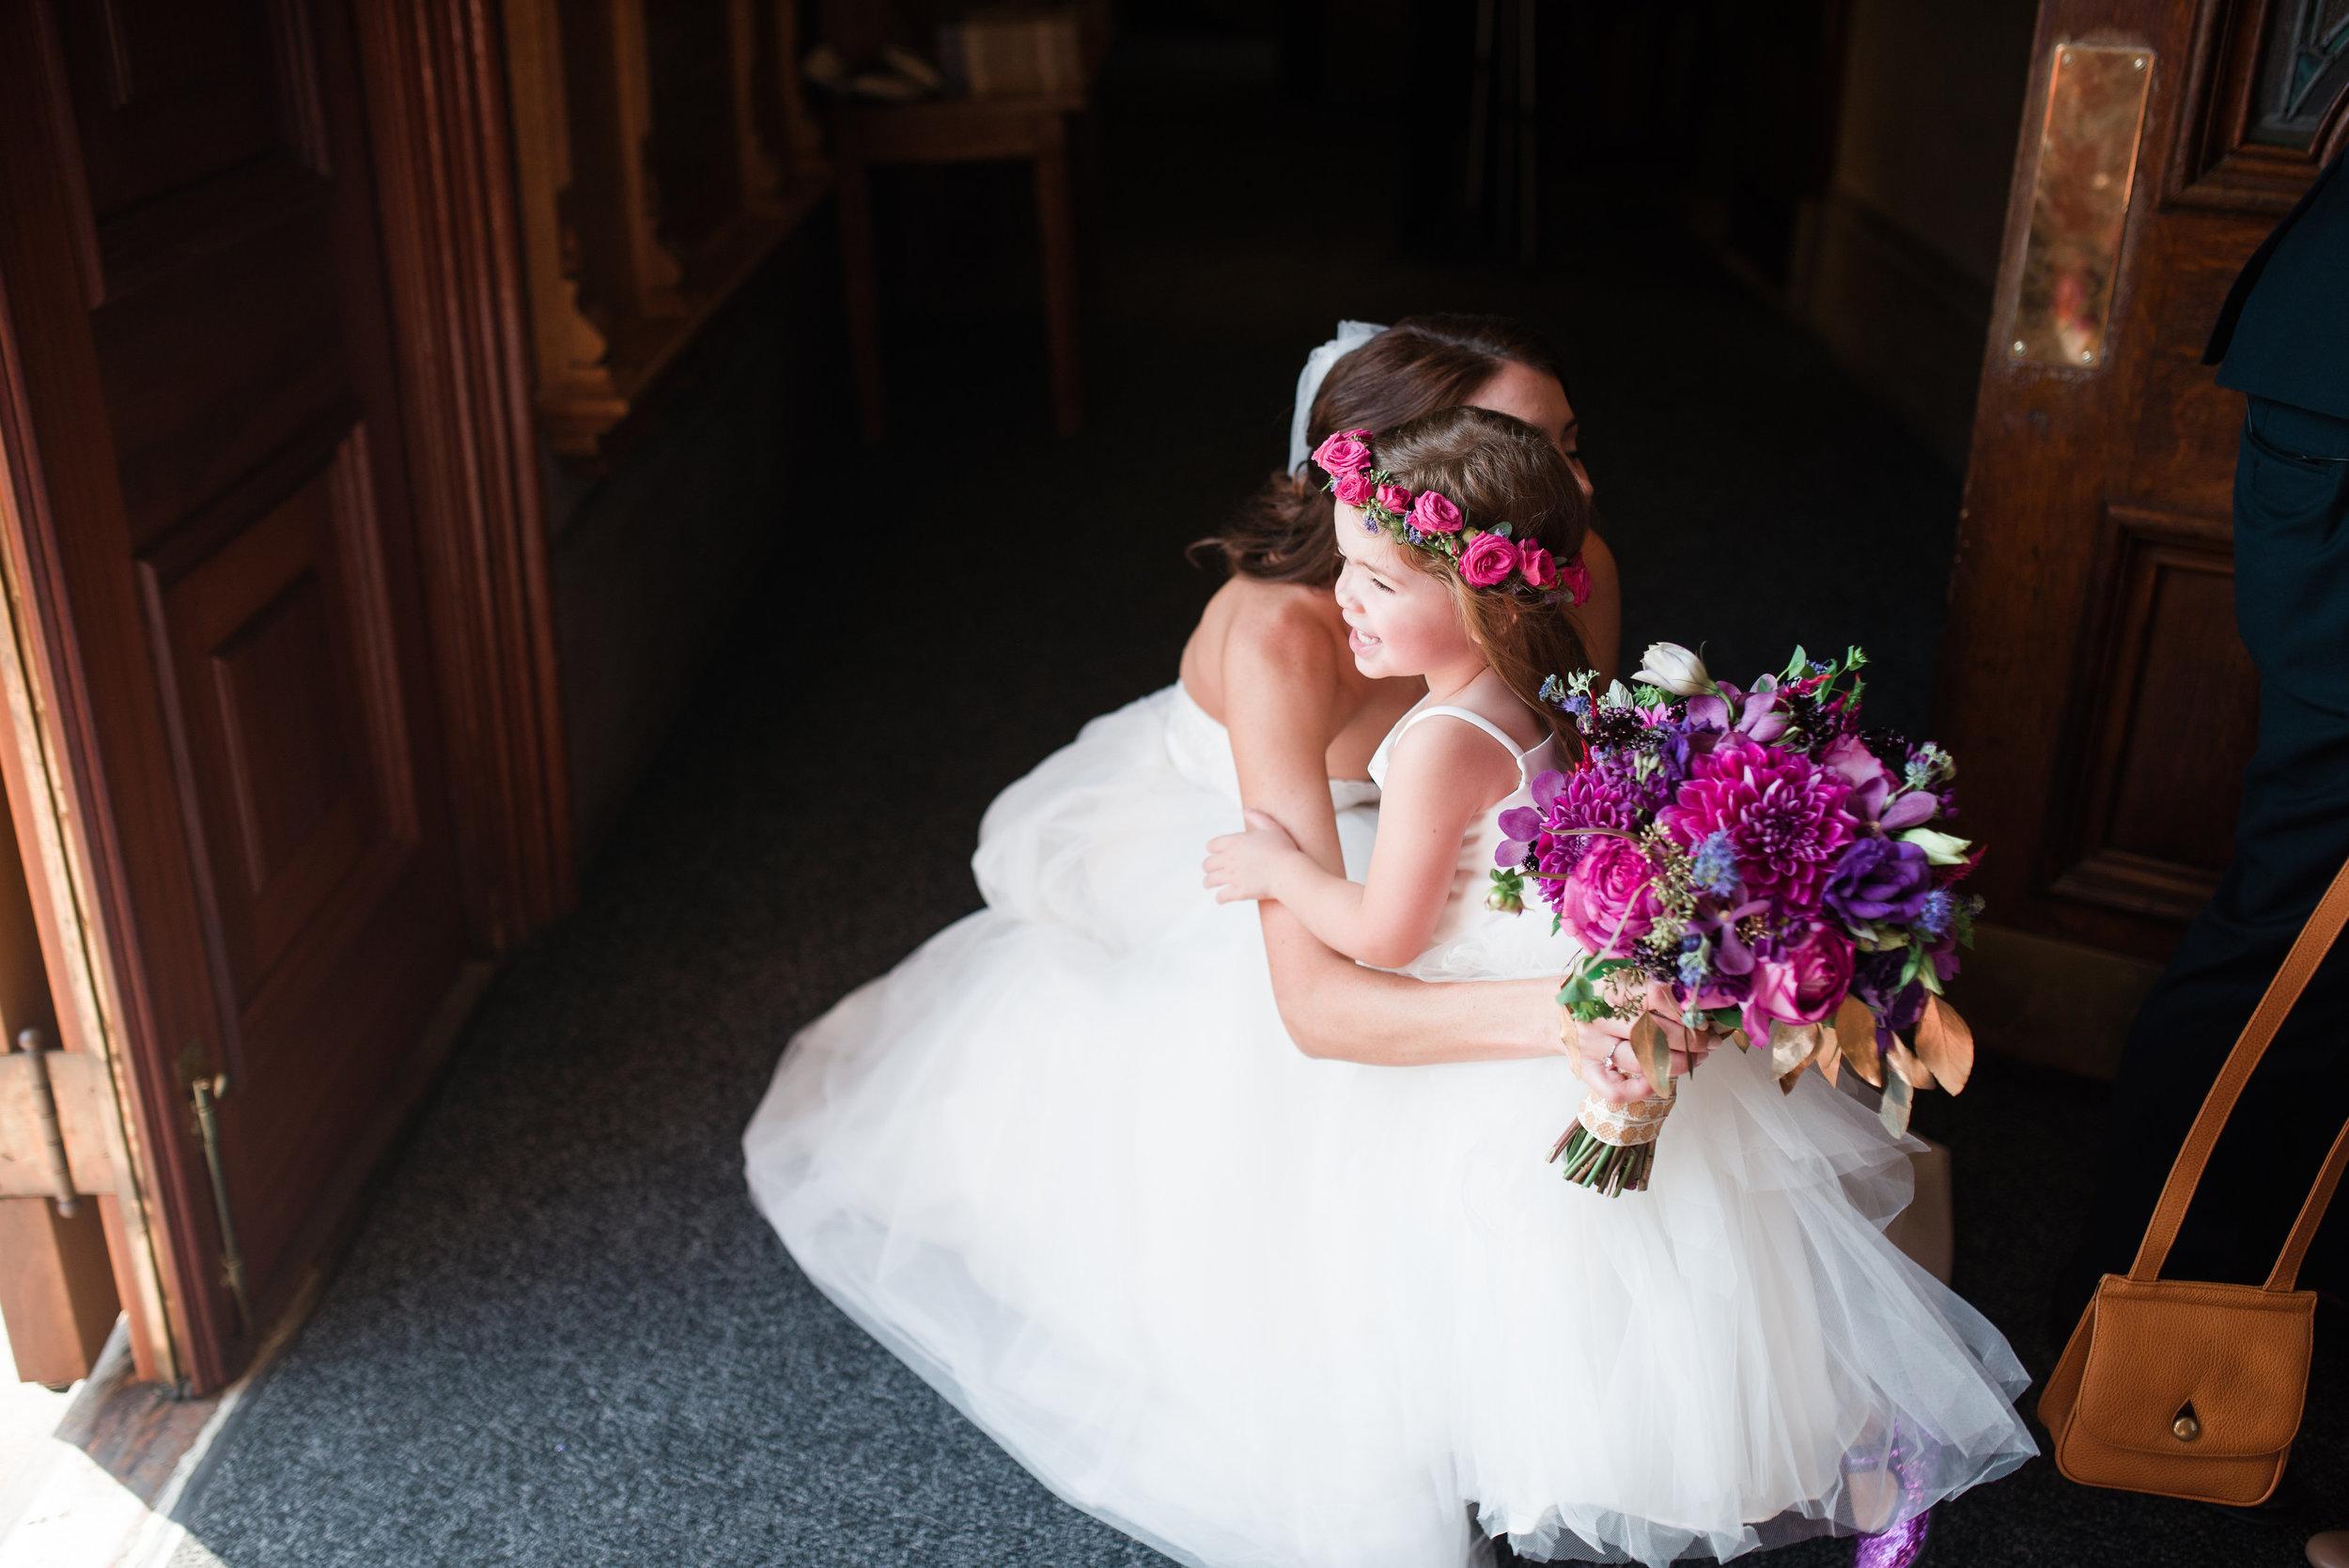 Philadelphia Wedding, Power Plant Productions, Purple Bouquet, Flower Crown, Flower Girl, Pink Flowers, Allison Dunn Photography